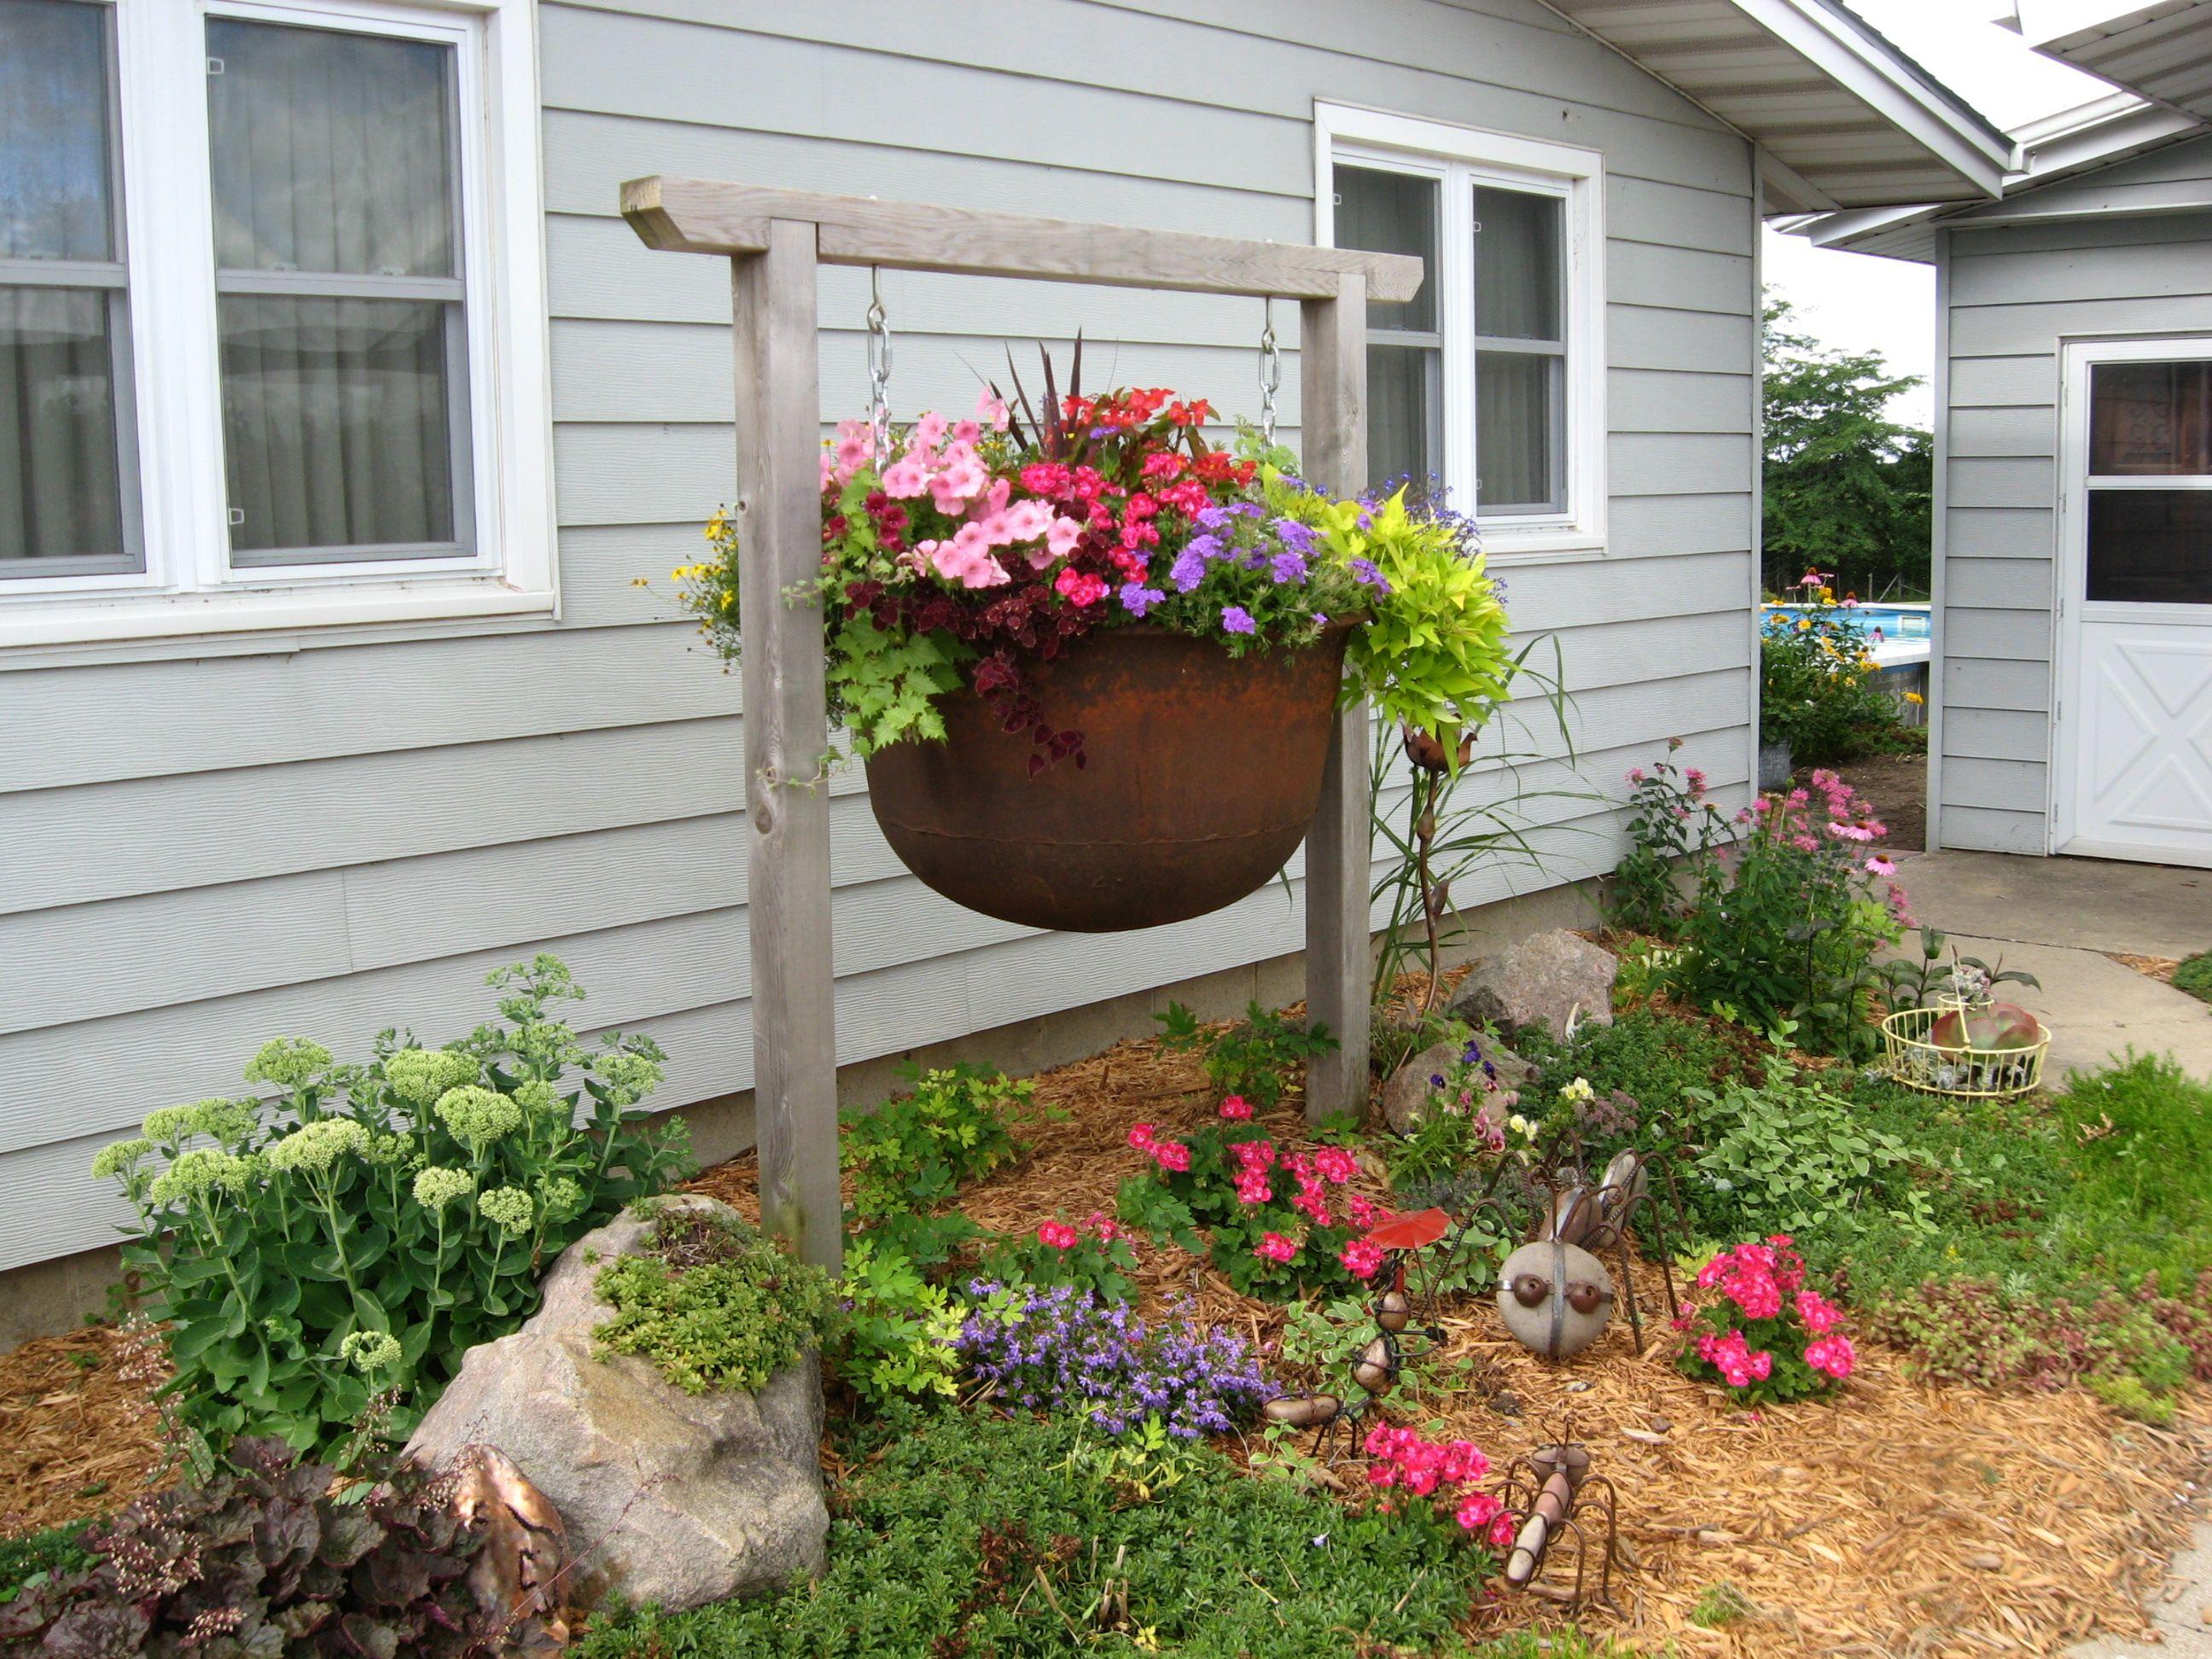 Garden Hanging Cauldron Filled With Flowers Garden Art